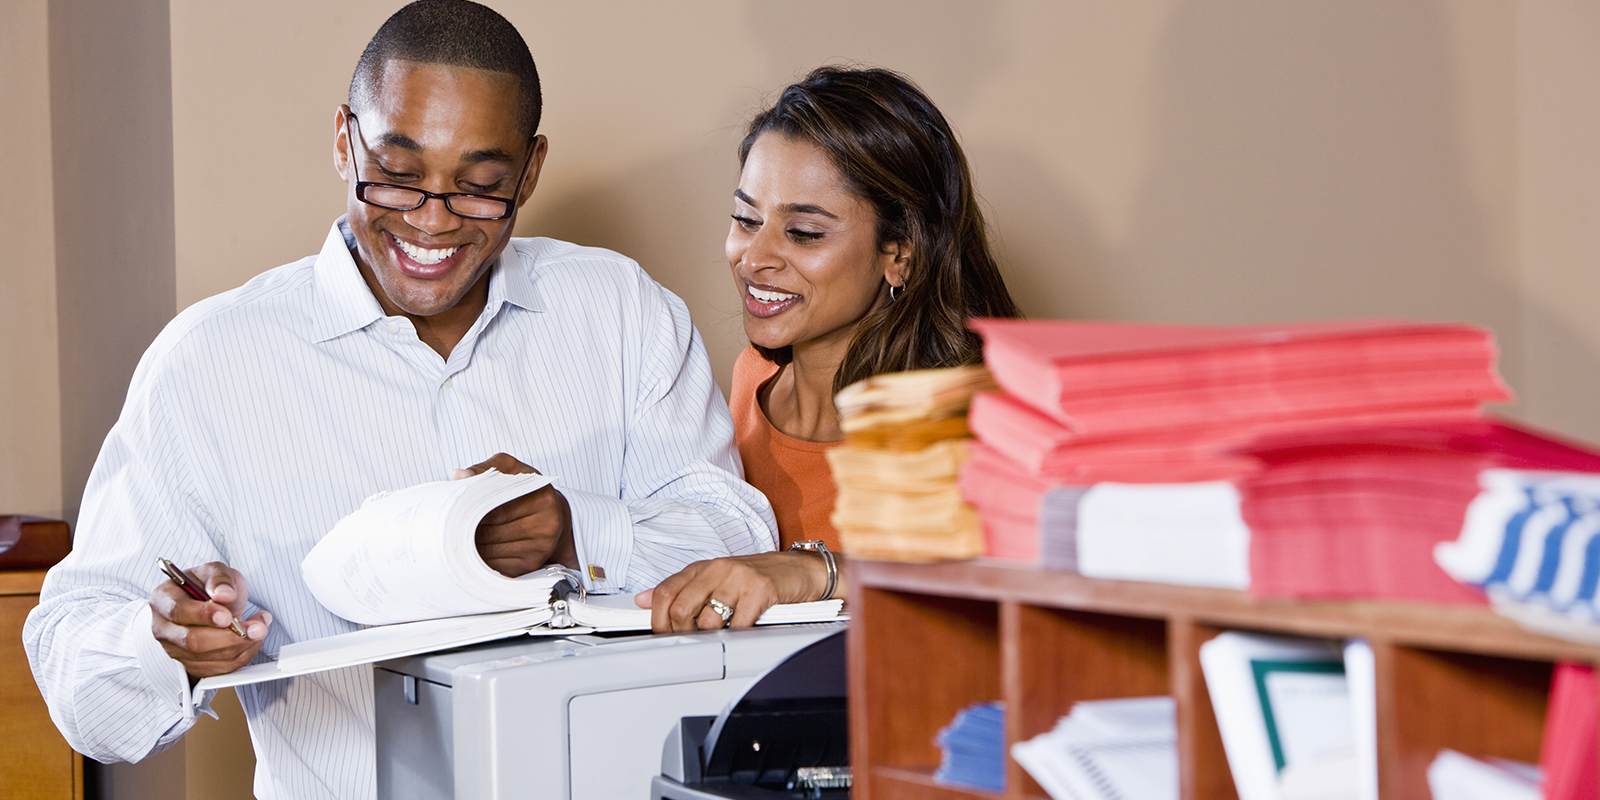 office printer assessment photo